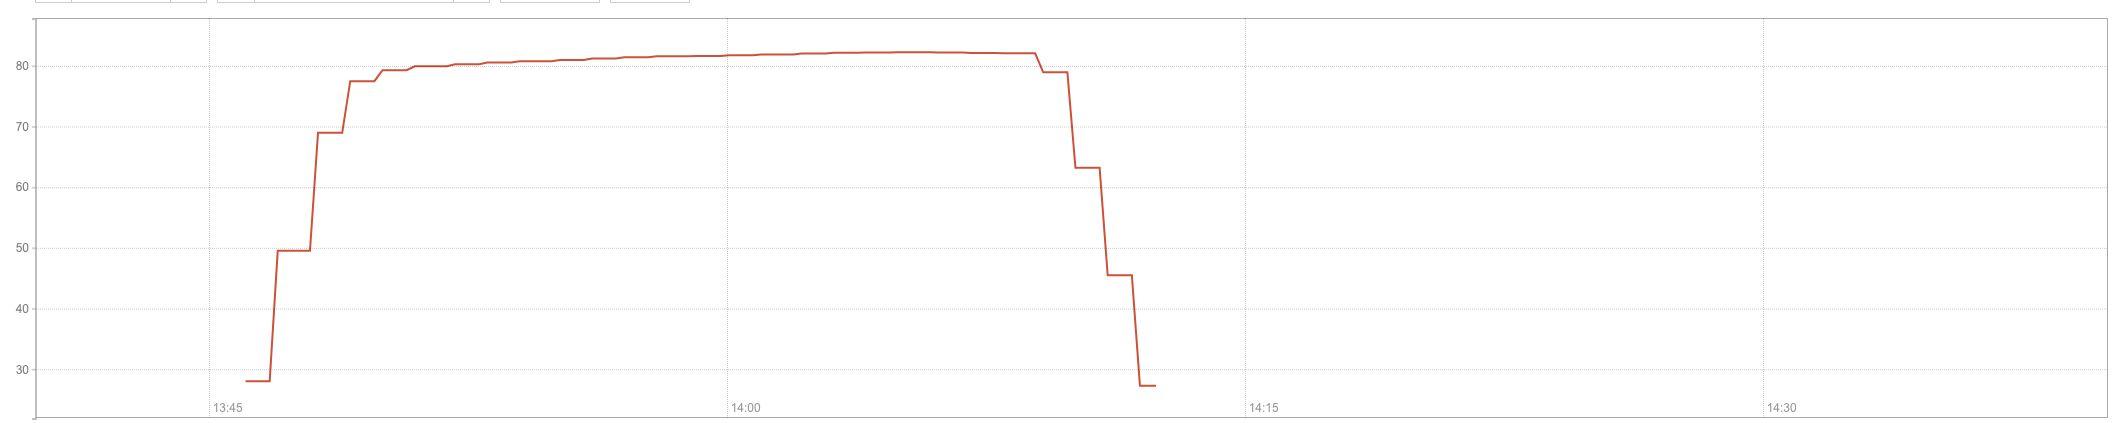 <b>中间件_数据库实验报告_高性价比</b>